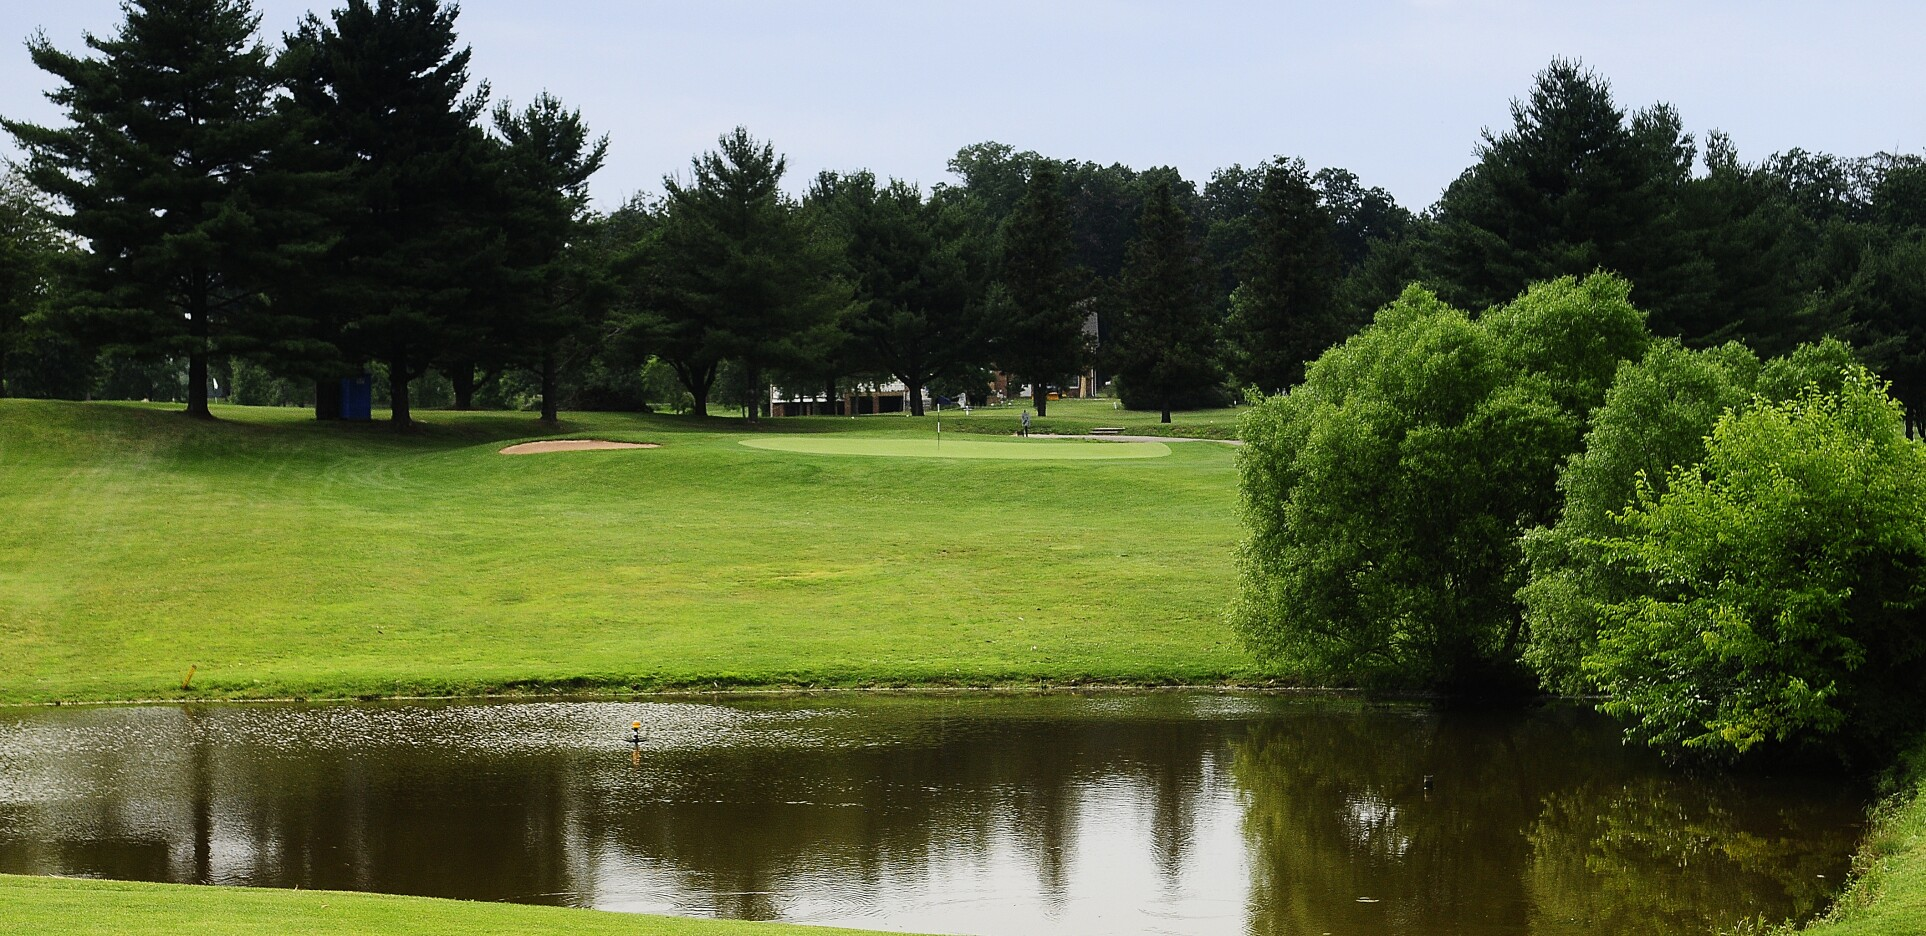 Prince William Golf Course in Nokesville VA